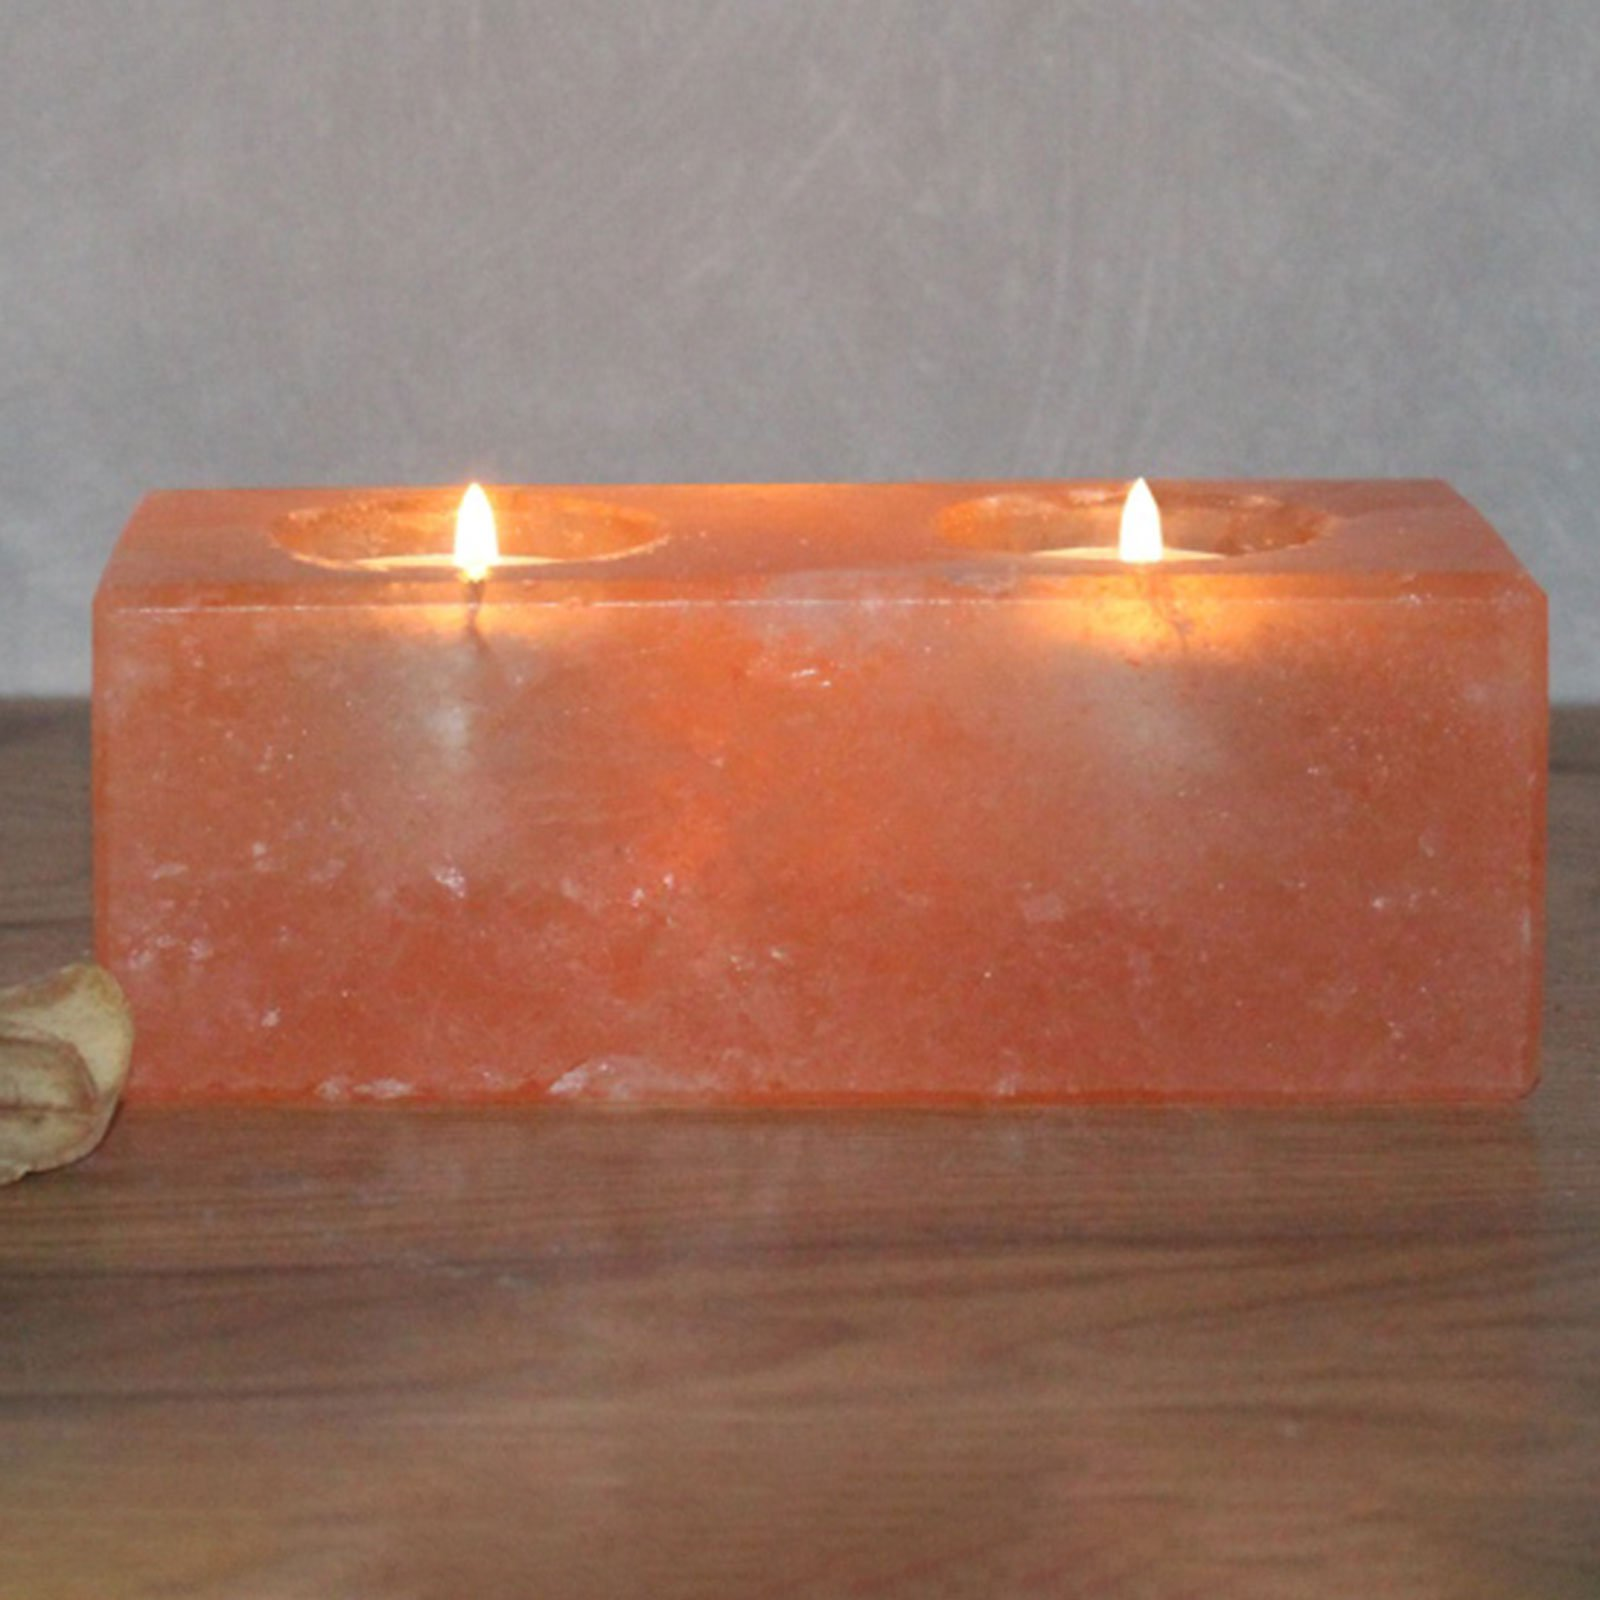 Twin Cube saltkrystall-telysholder